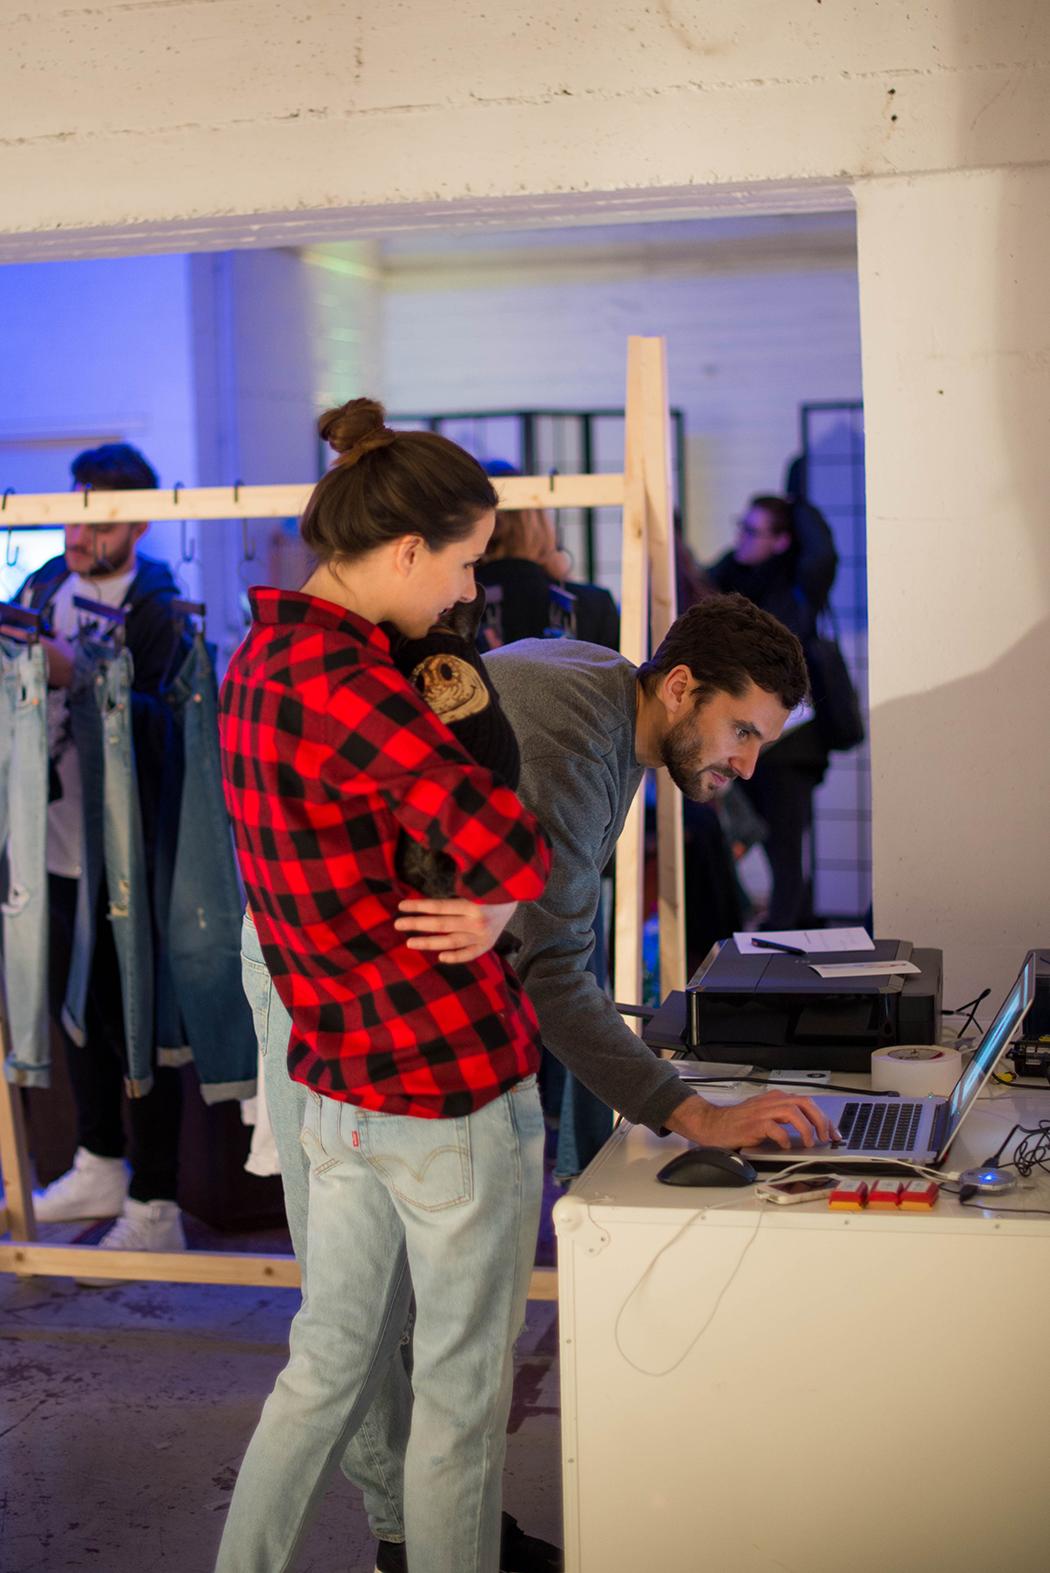 Levis-501-Berlin-Fashionblog-Deutschland-München-Fashionblogger-Bloggerevent-Lindarella-5